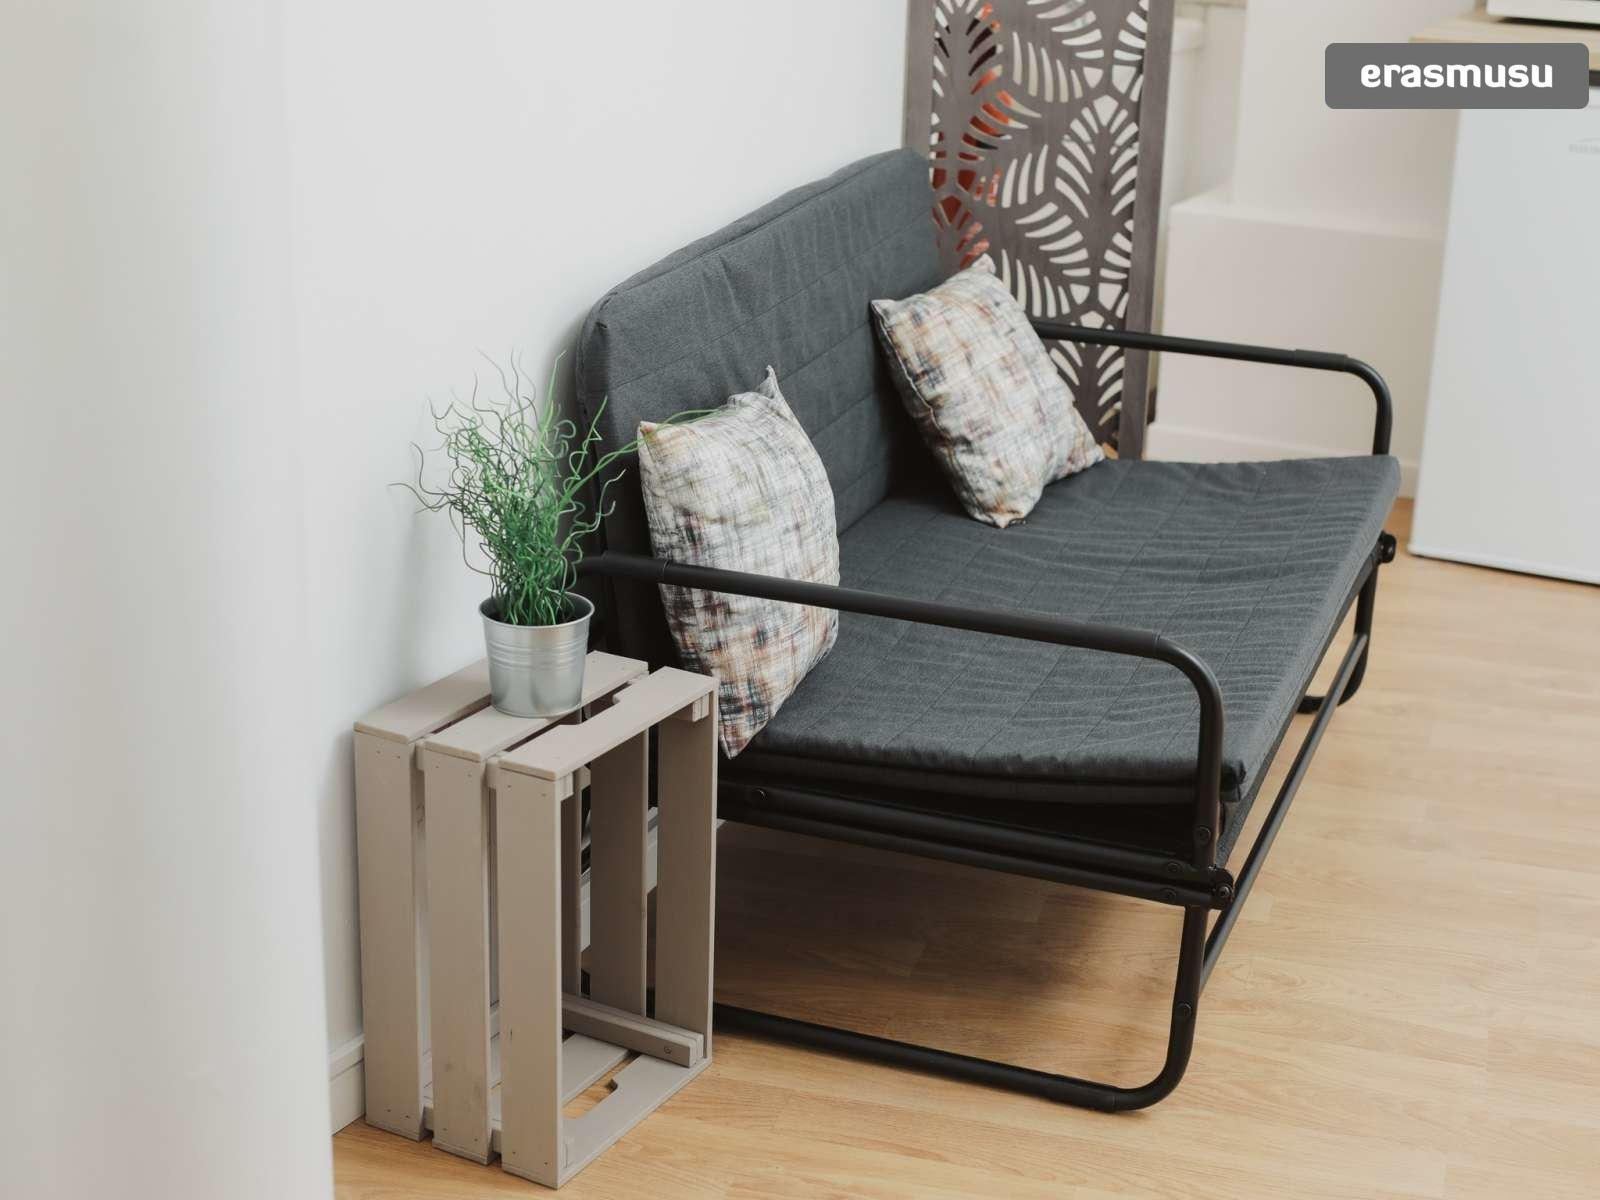 stunning-studio-apartment-rent-santo-ildefonso-ea488c30820cb99f4